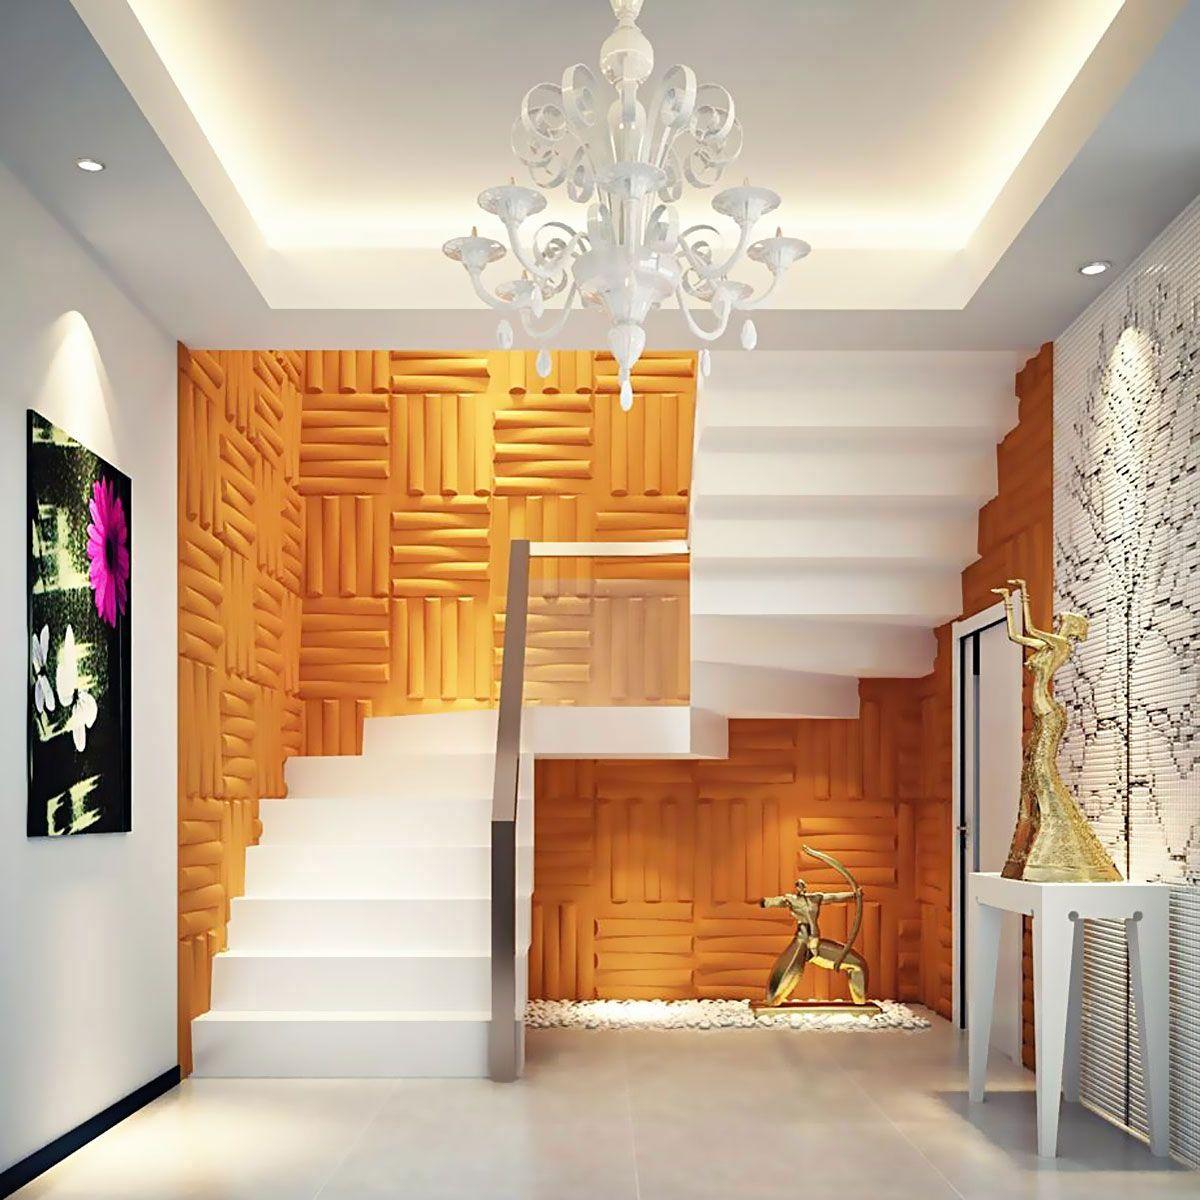 19 5 8 inch w x 19 5 8 inch h naomi endurawall decorative - Decorative wall panels for interiors ...